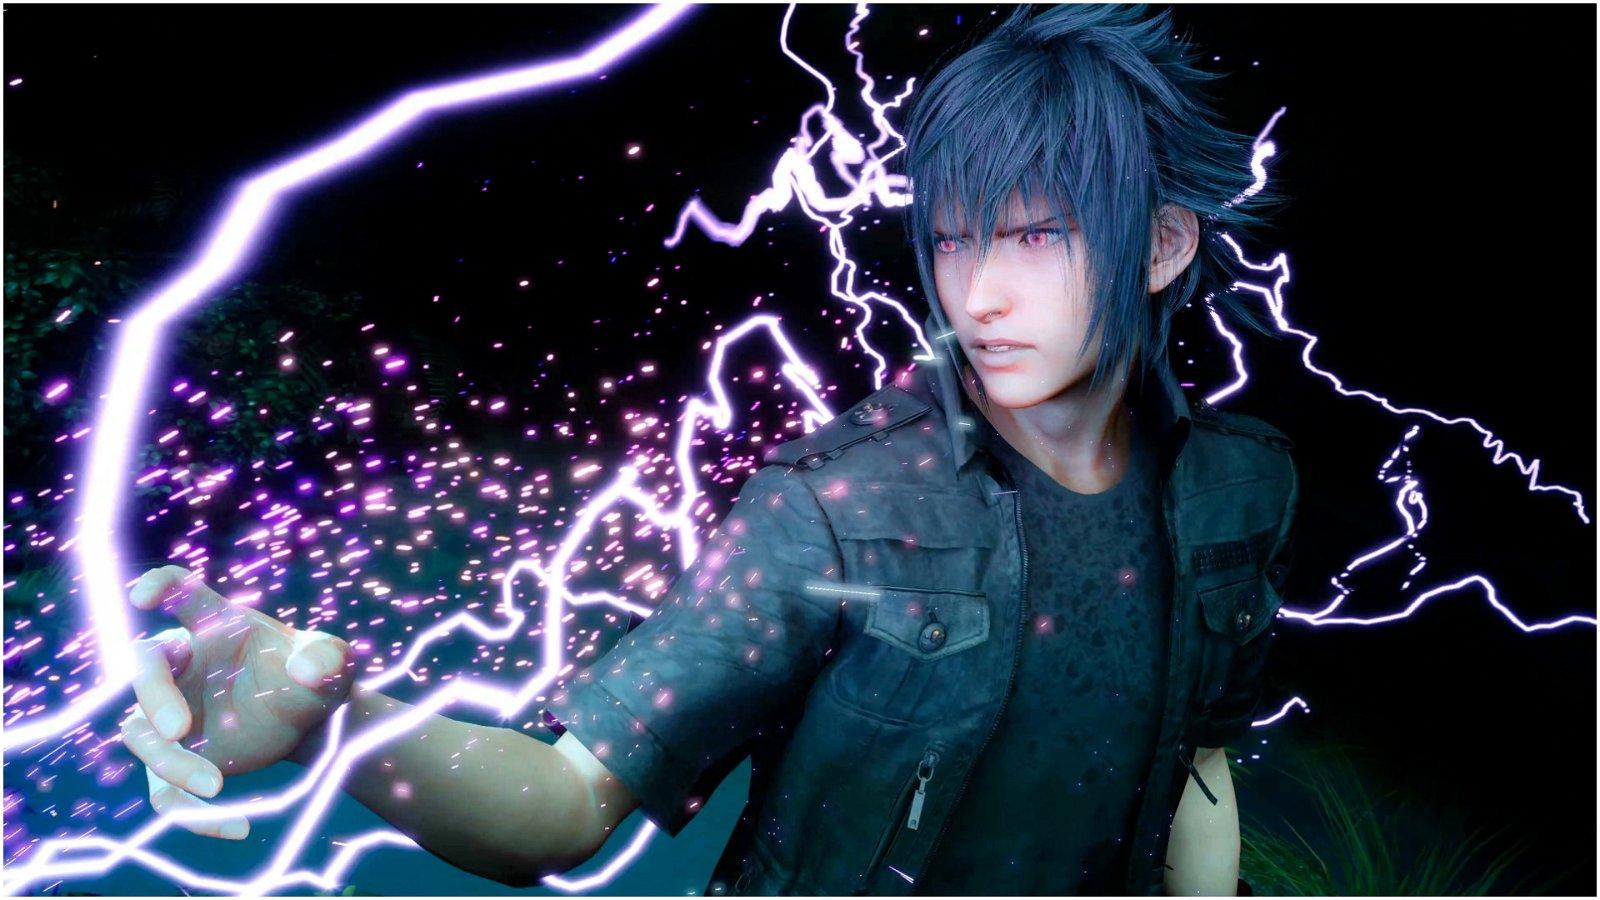 Final Fantasy XV (Windows Edition) Review